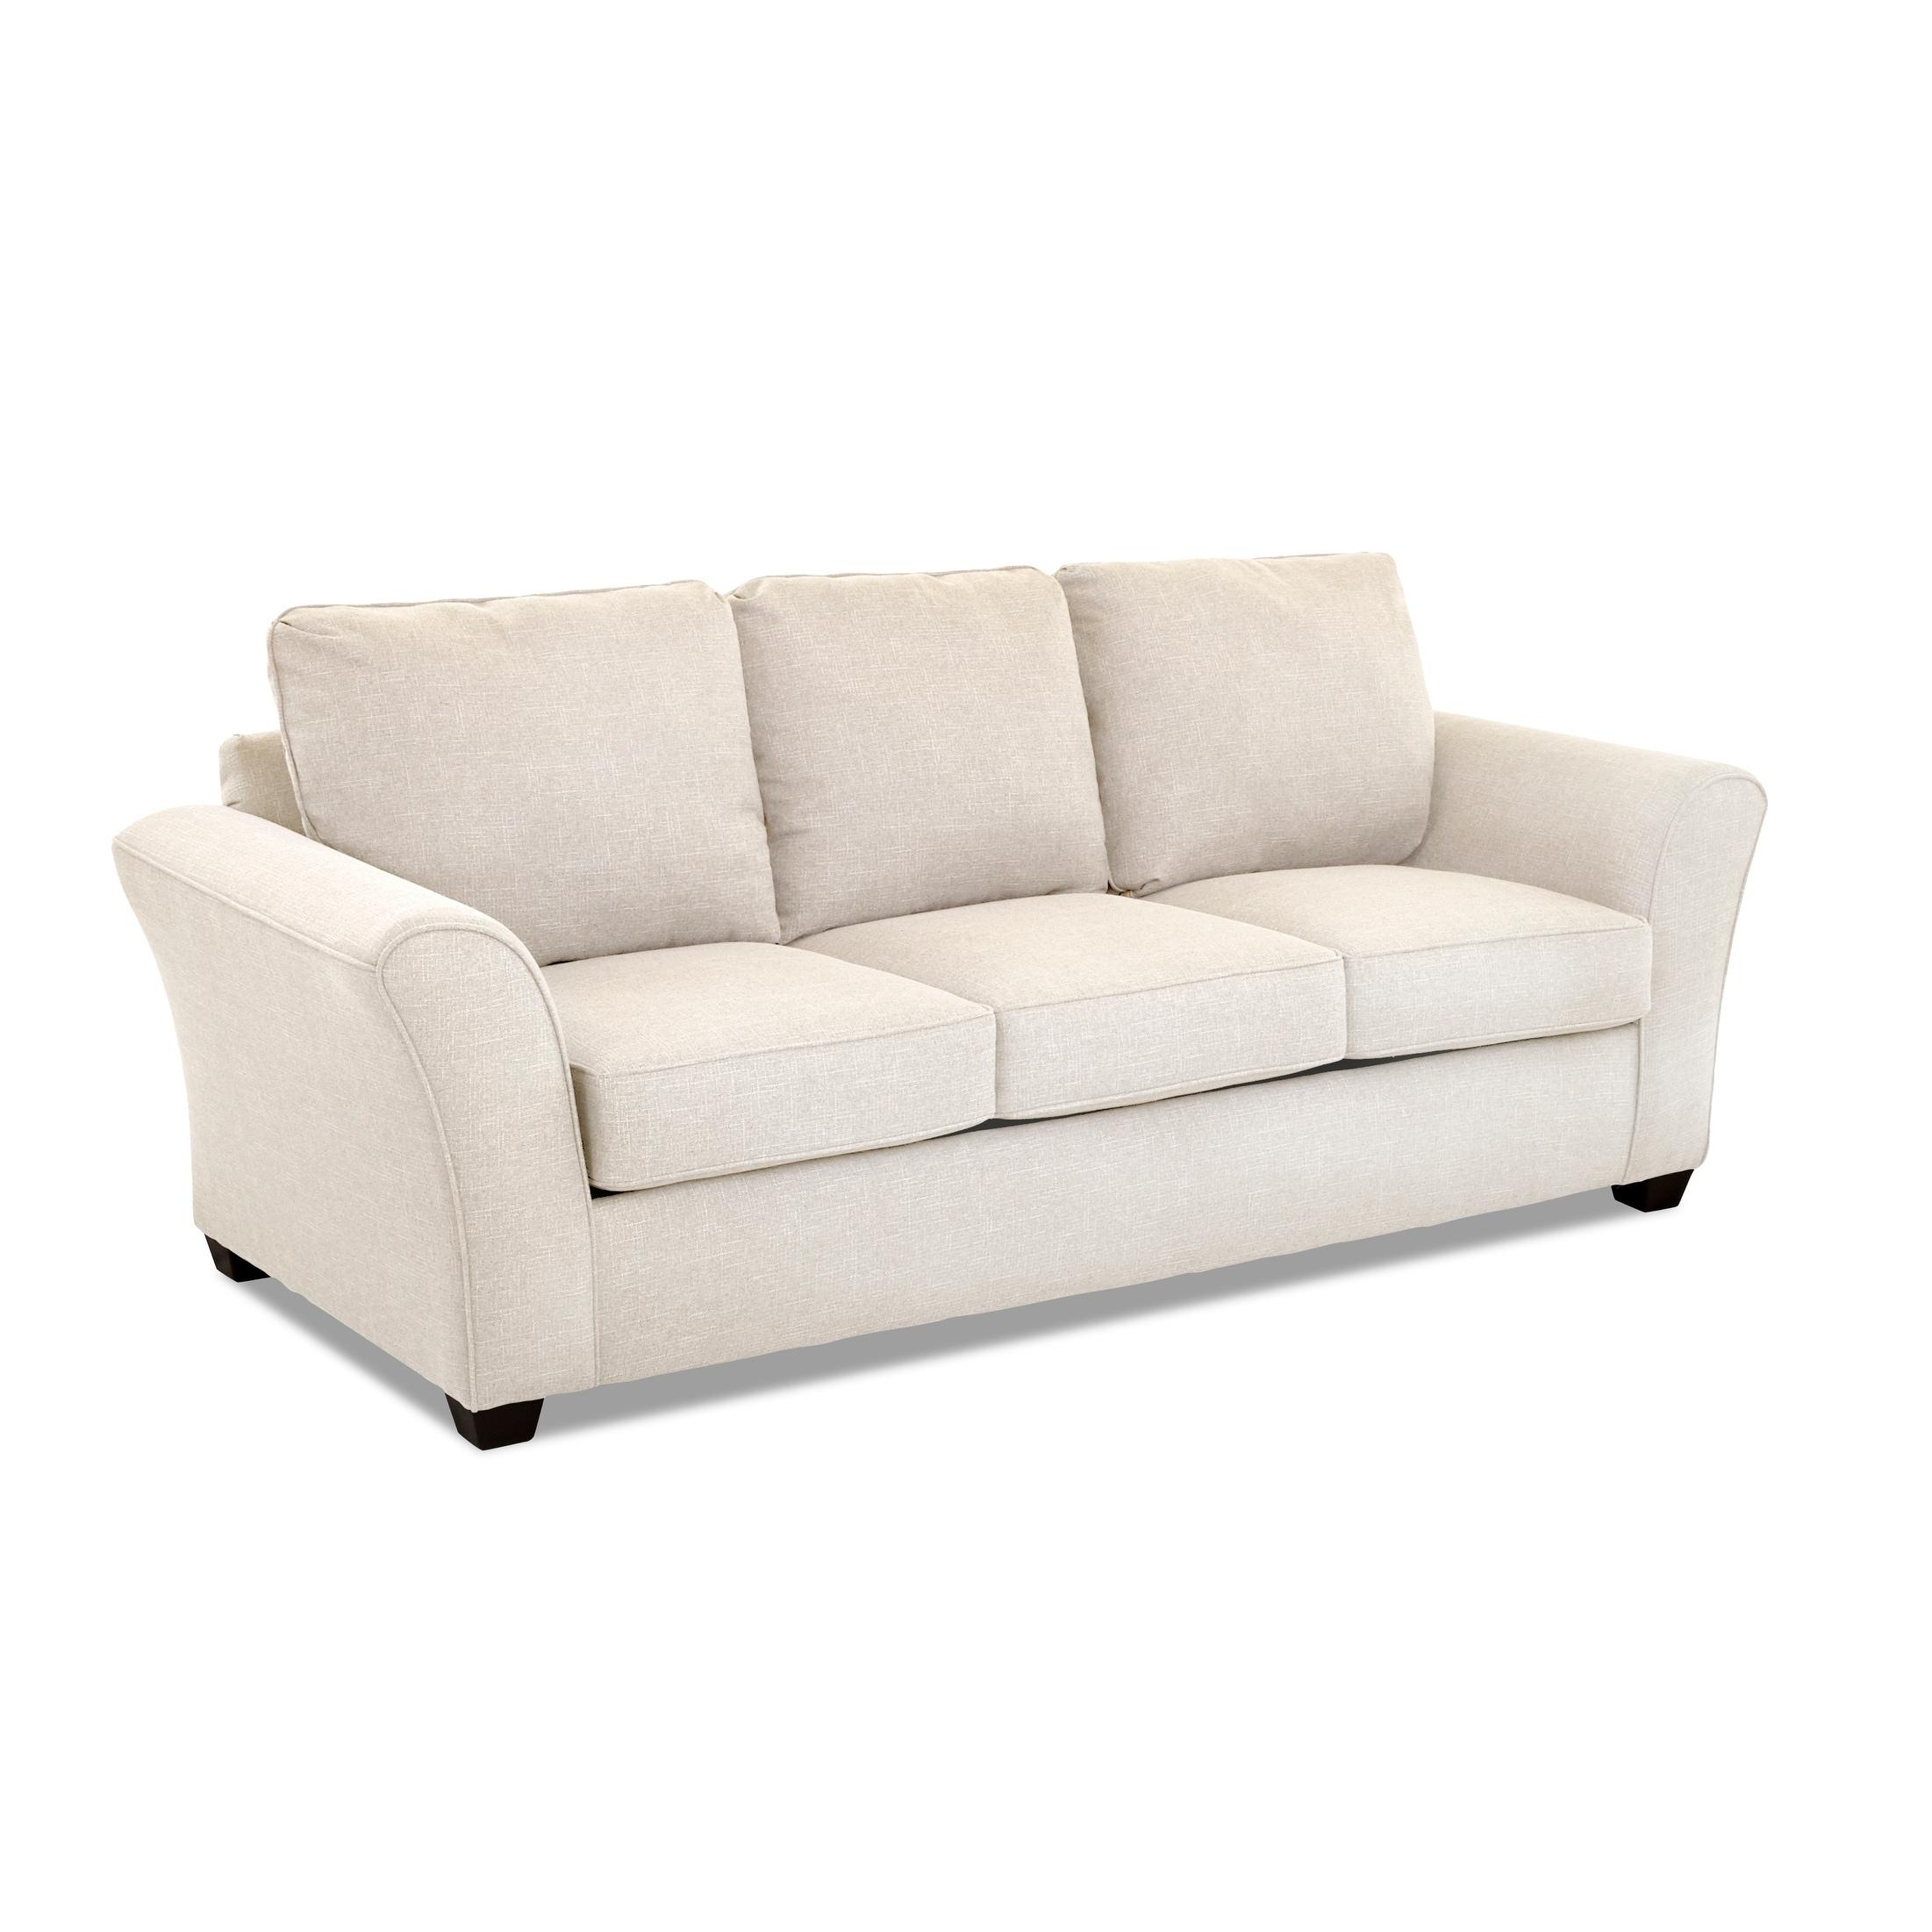 - Shop Stella Sleeper Sofa, Queen-size - On Sale - Overstock - 29158914